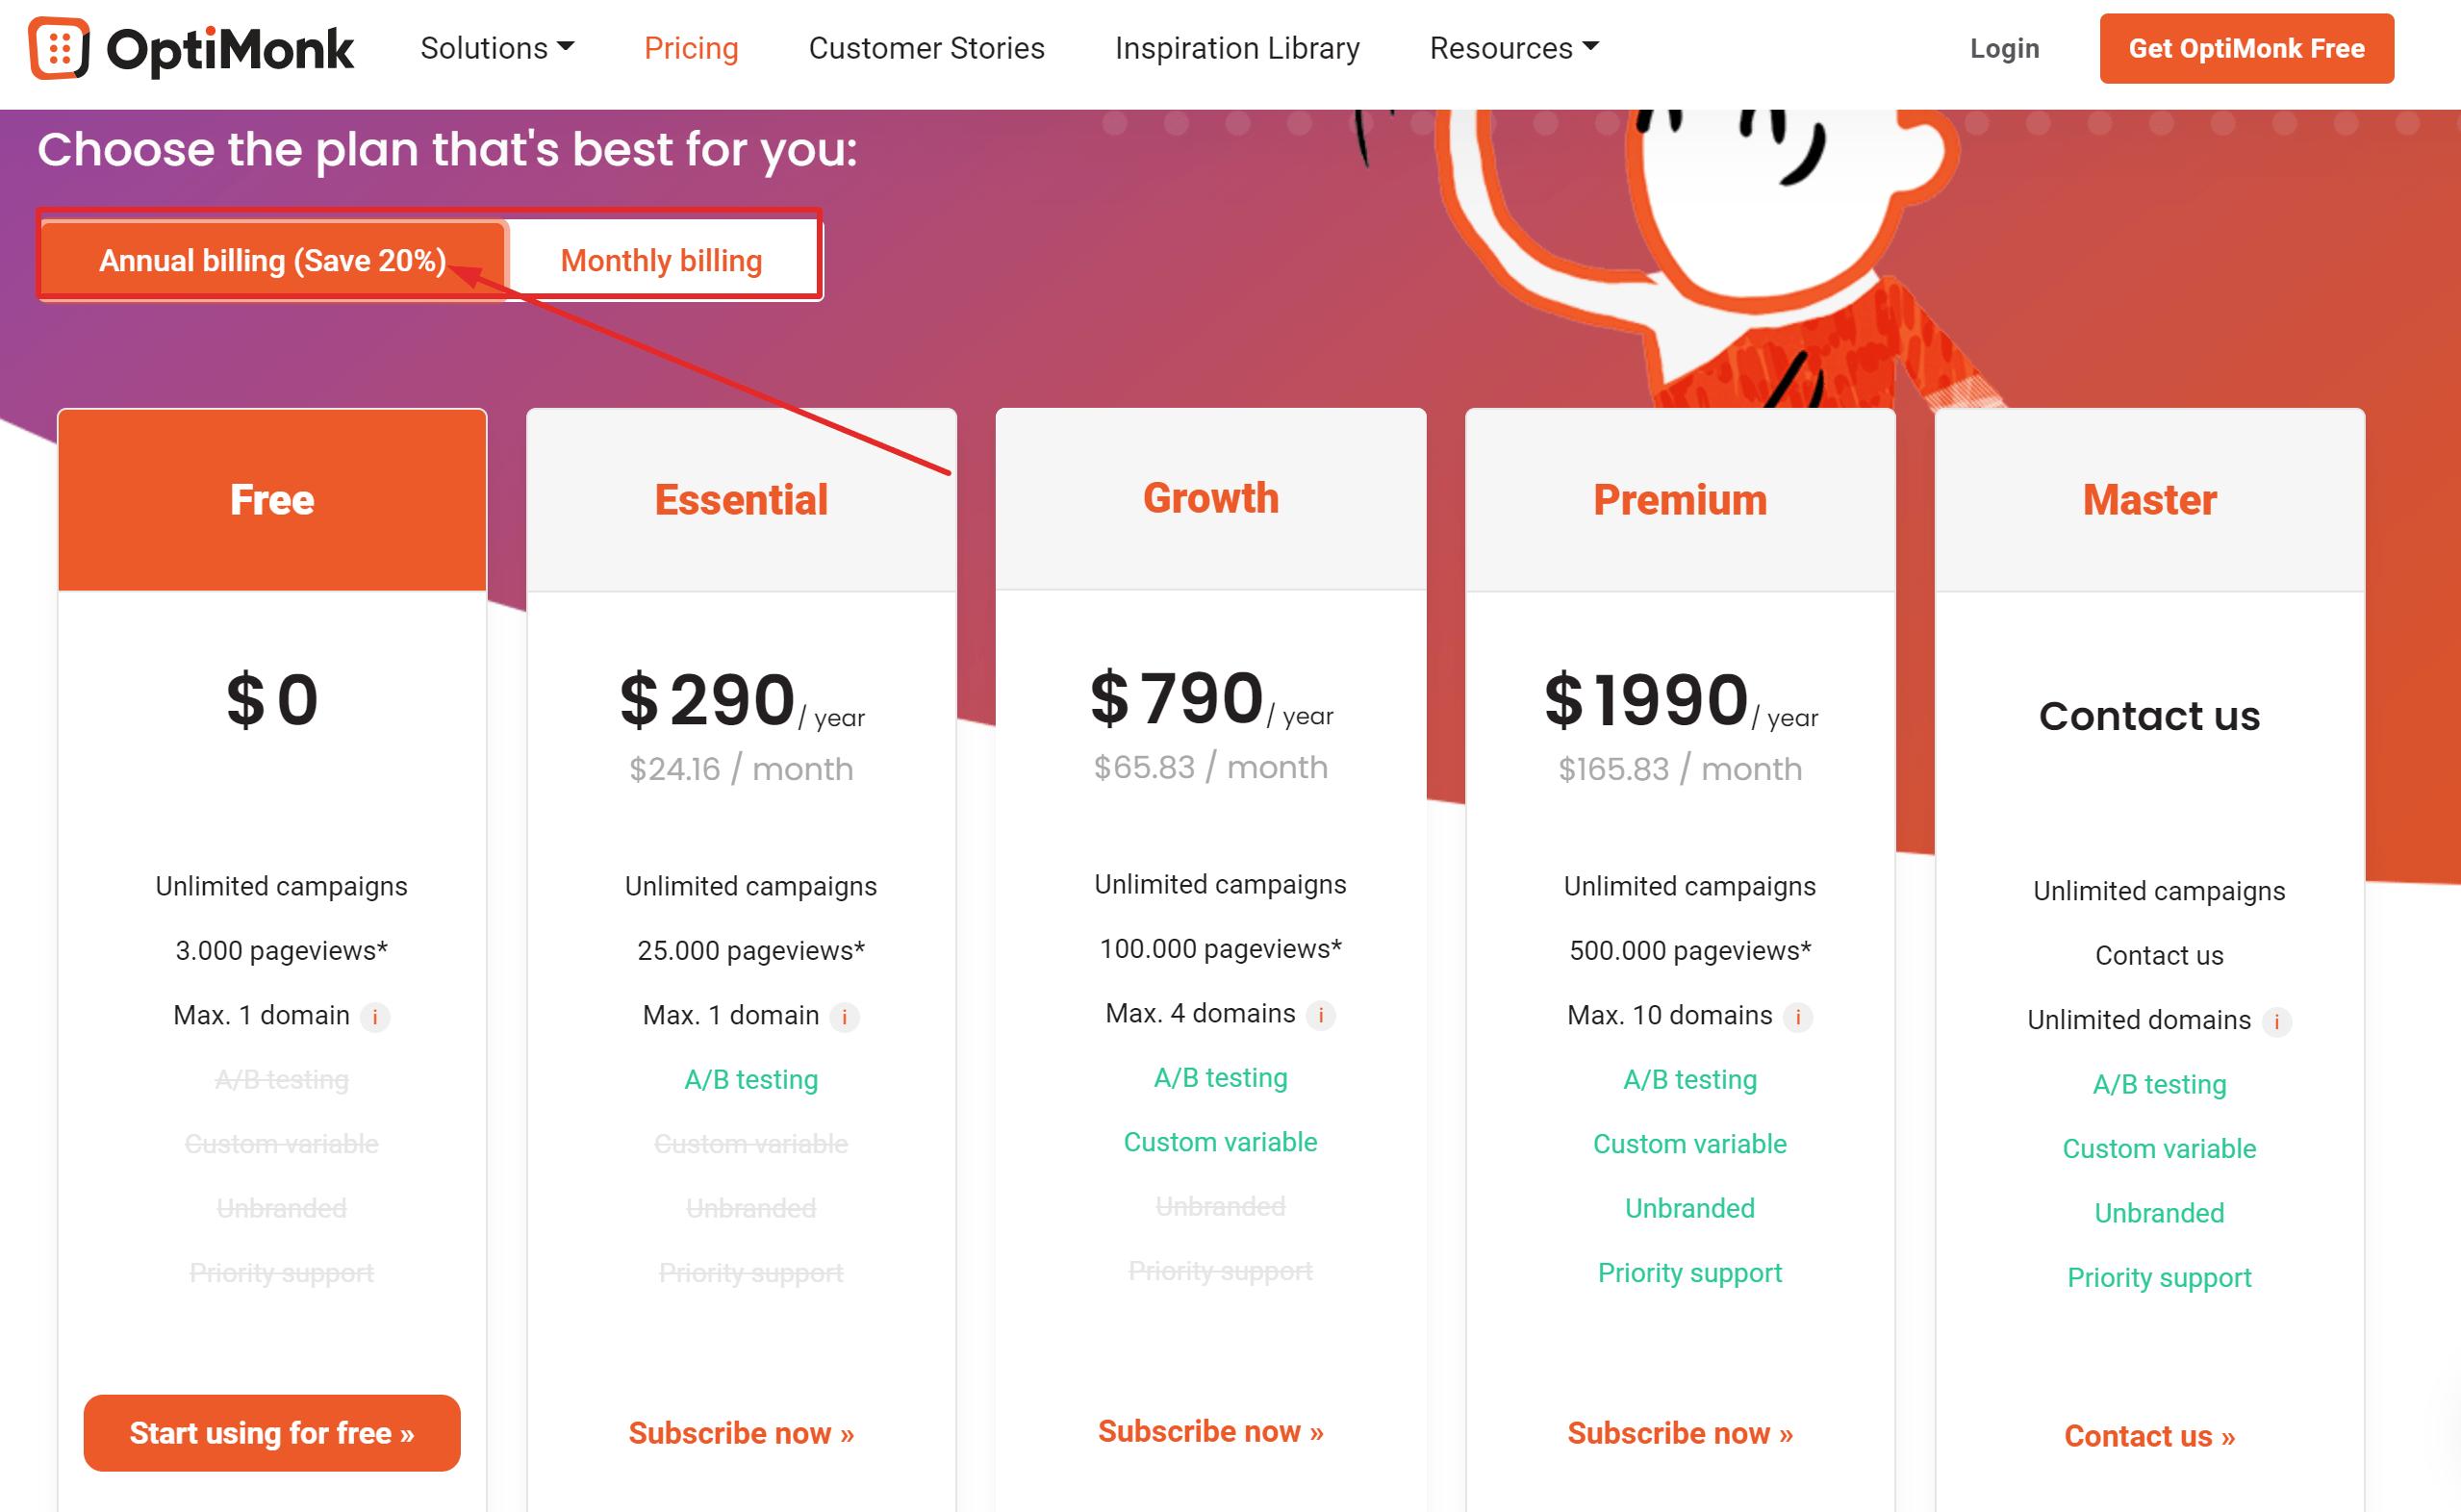 Optimonk coupon code